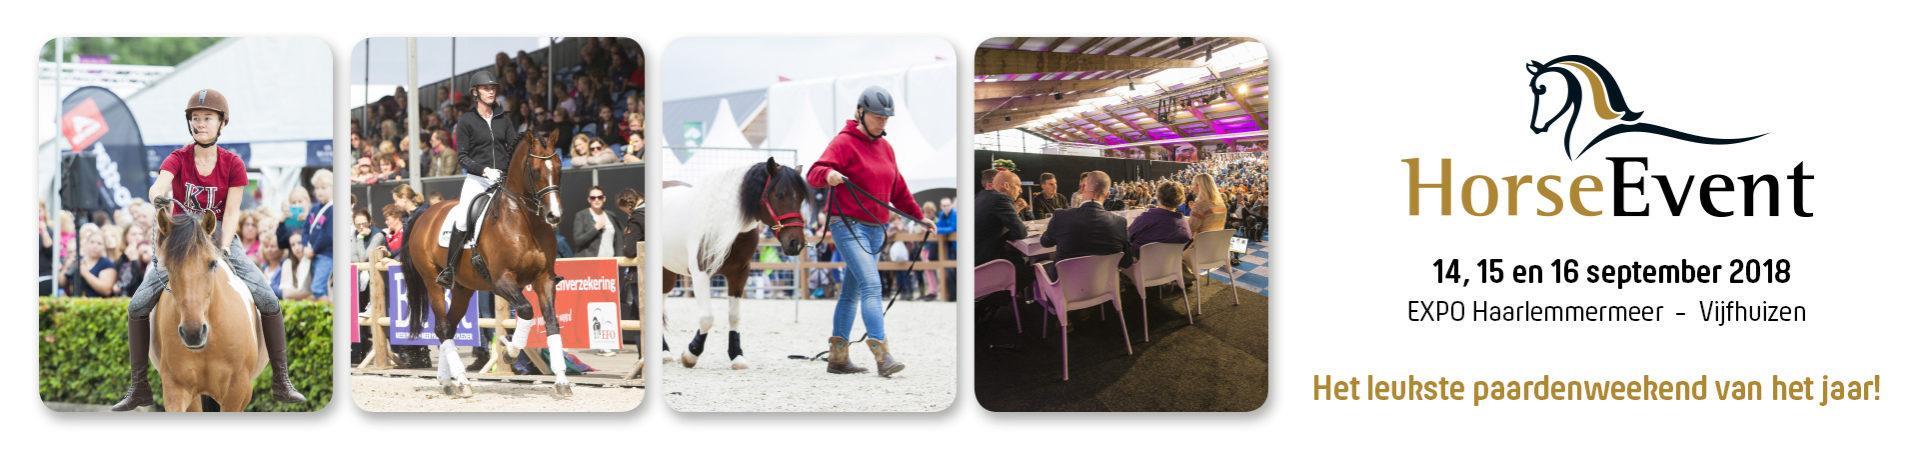 Horse Event 20181920x450 Ticketpoint